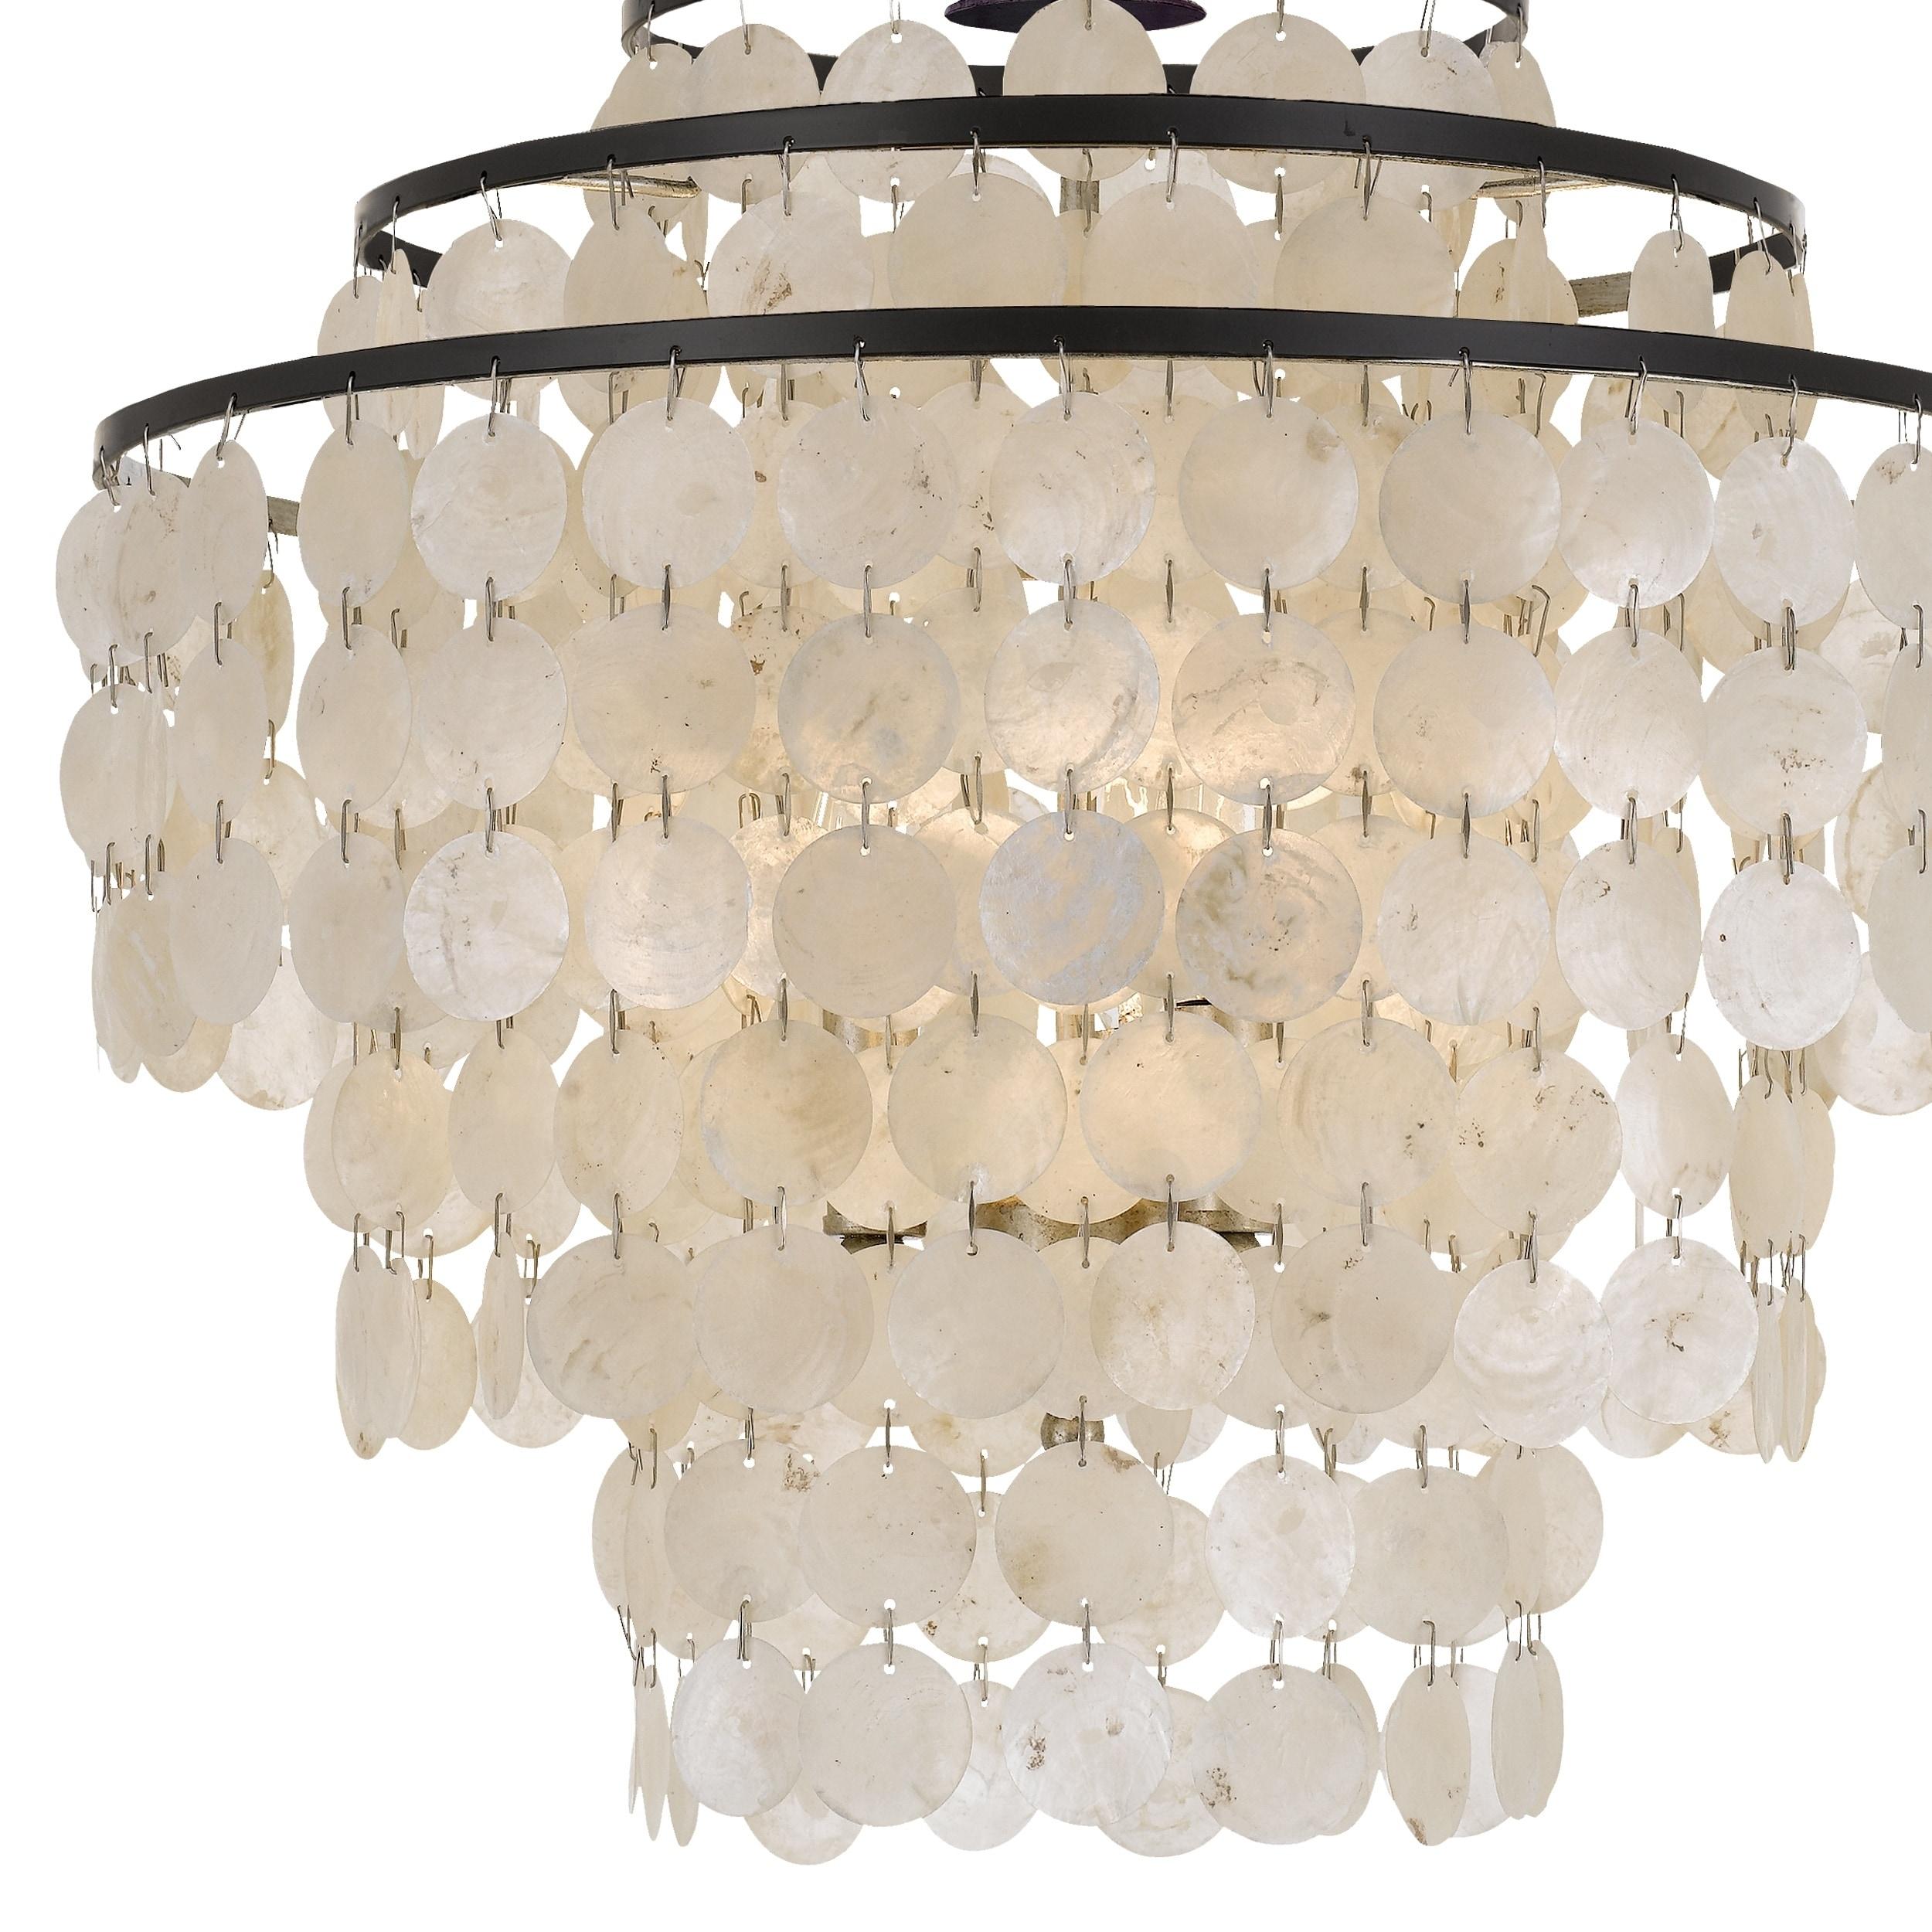 Shop Black Friday Deals On The Curated Nomad Rockdale 4 Light Capiz Shell Chandelier Overstock 21234807